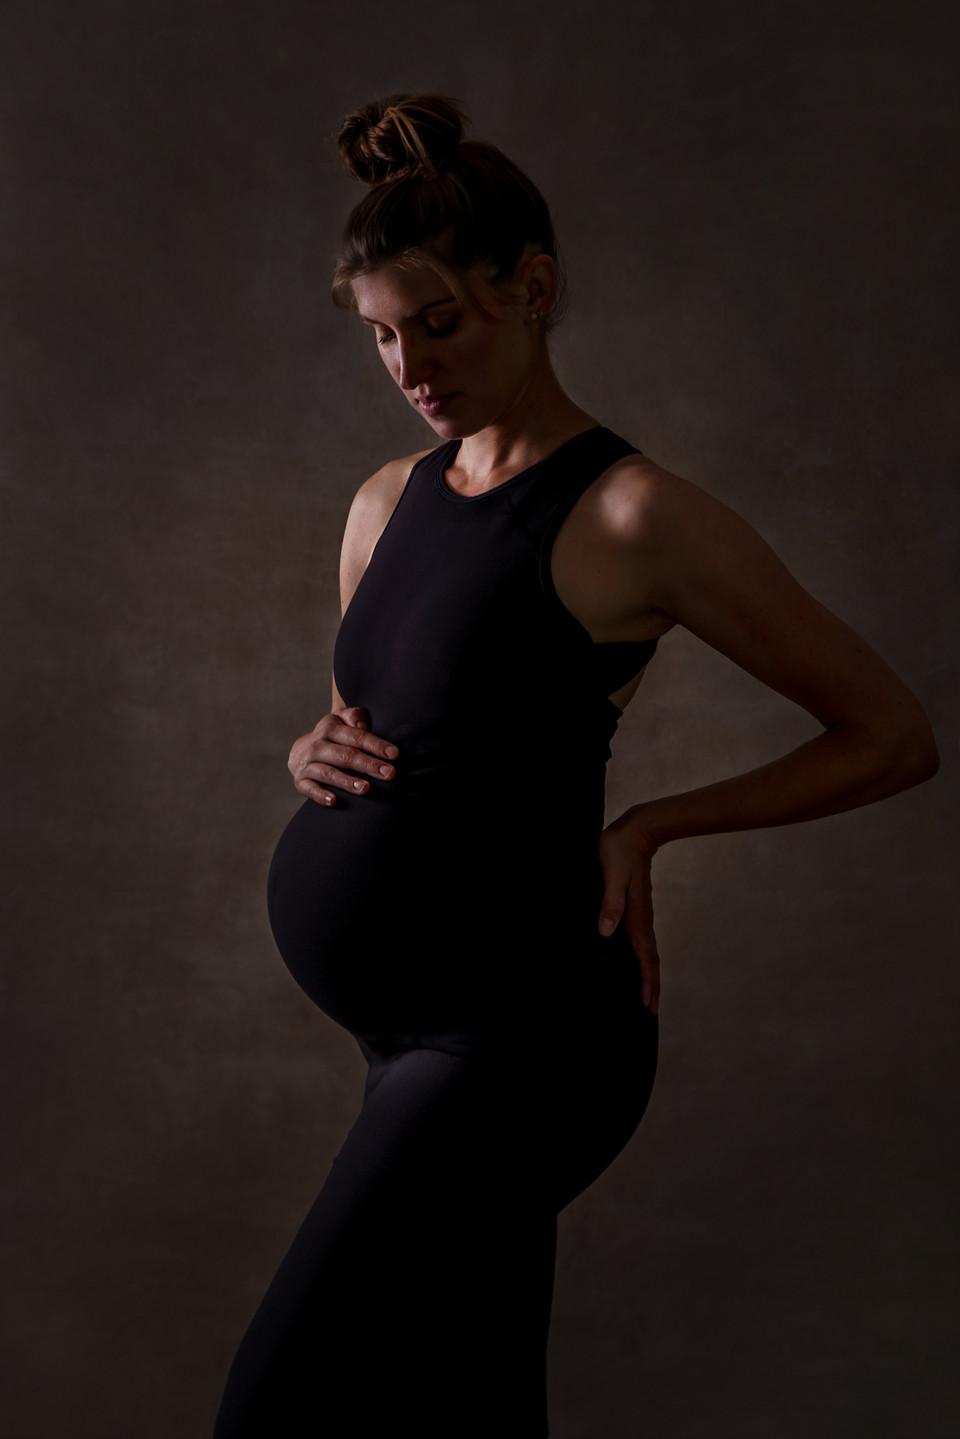 fine art portrait pregnant woman by fleu